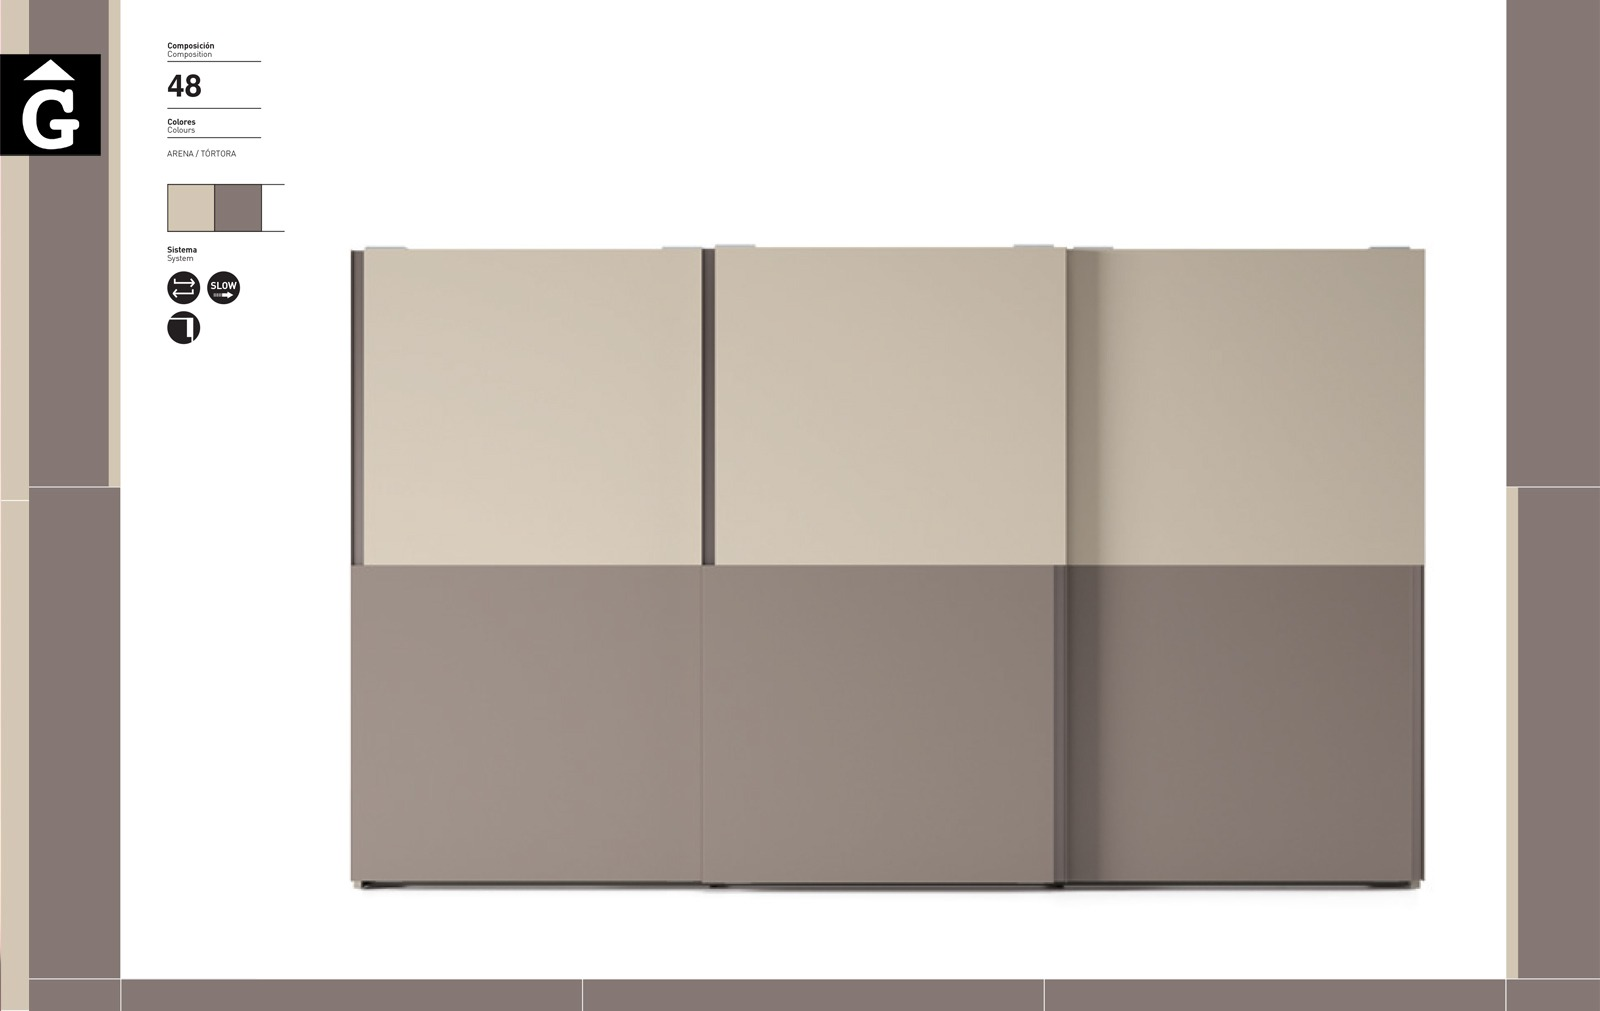 Armari portes correderes Tecto JJP NoLimits by Mobles GIFREU Girona Armaris a mida modern minim elegant atemporal